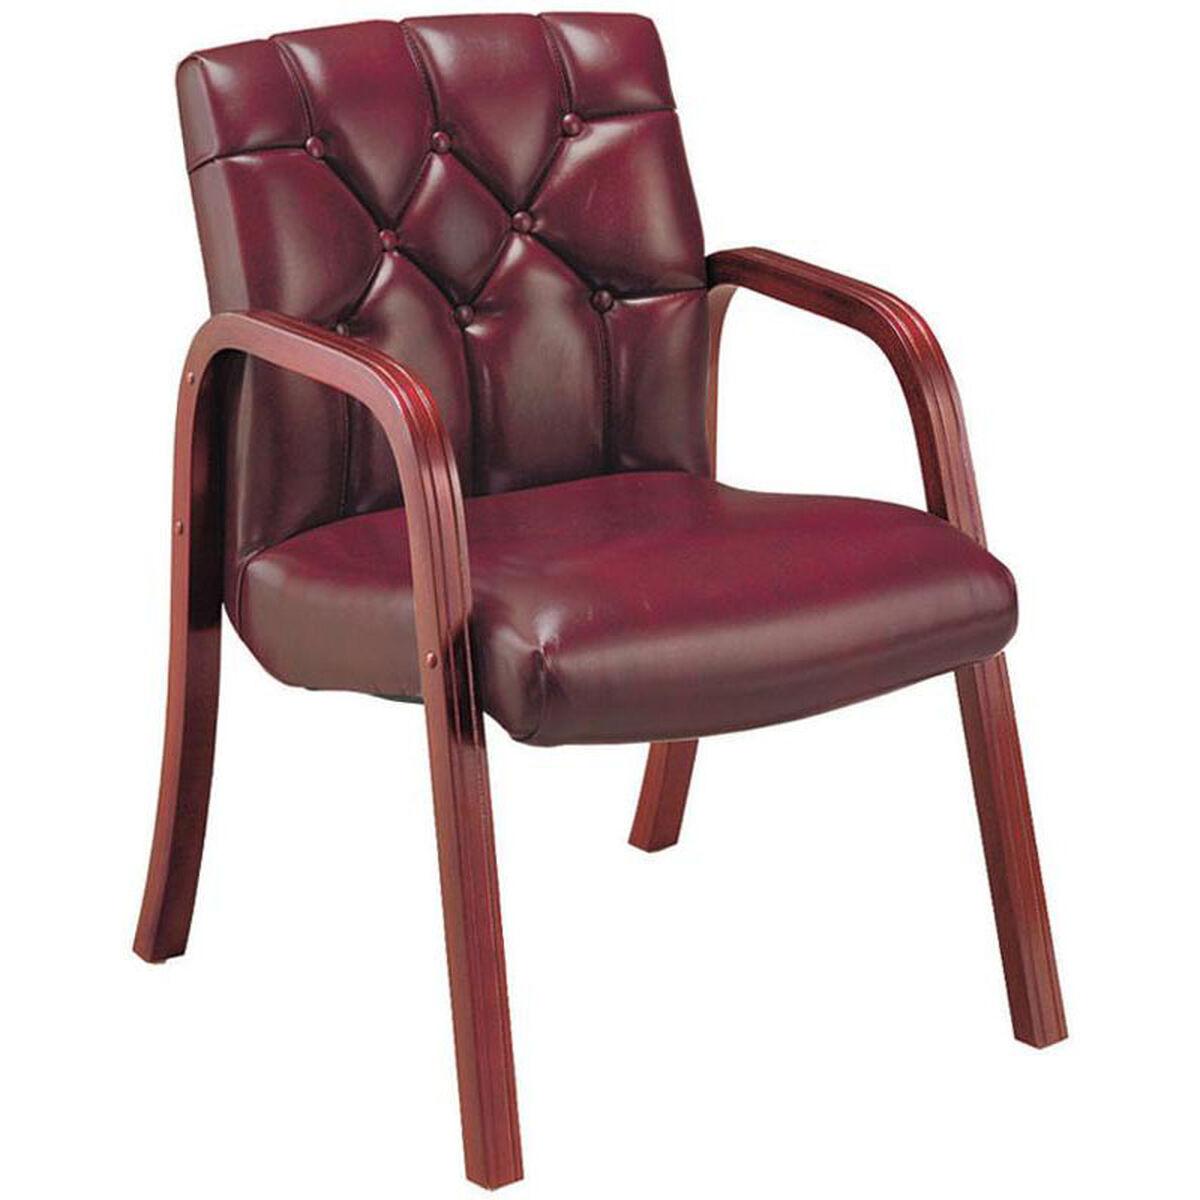 High Point Furniture Industries 4833 Hpf 4833